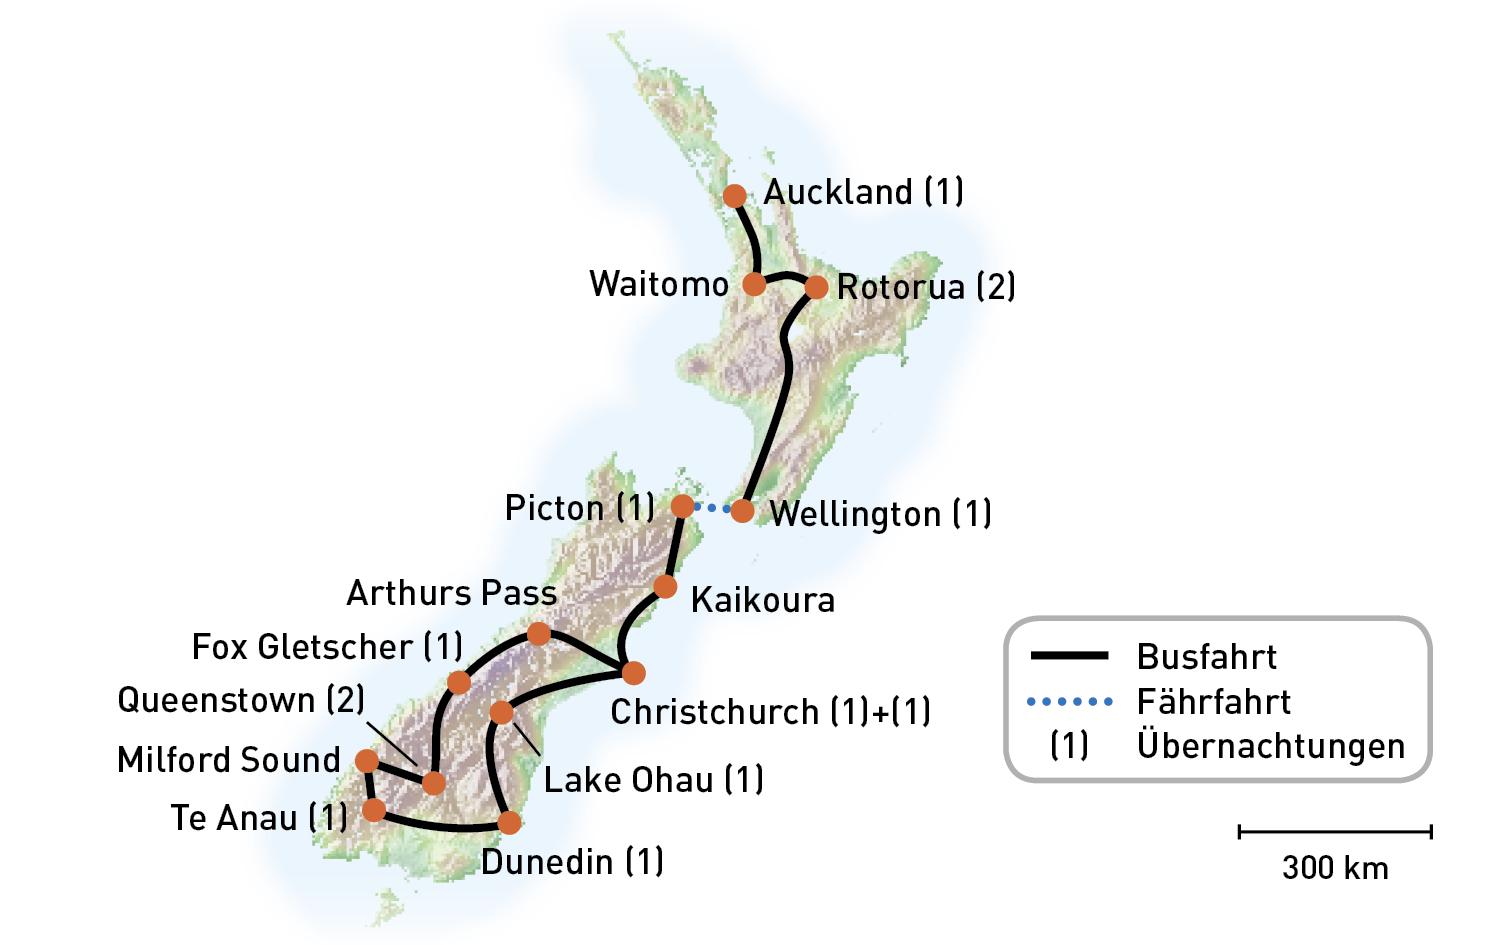 Routenkarte_Neuseeland_VulkaneUndFjorde_KiKa2020_RGB